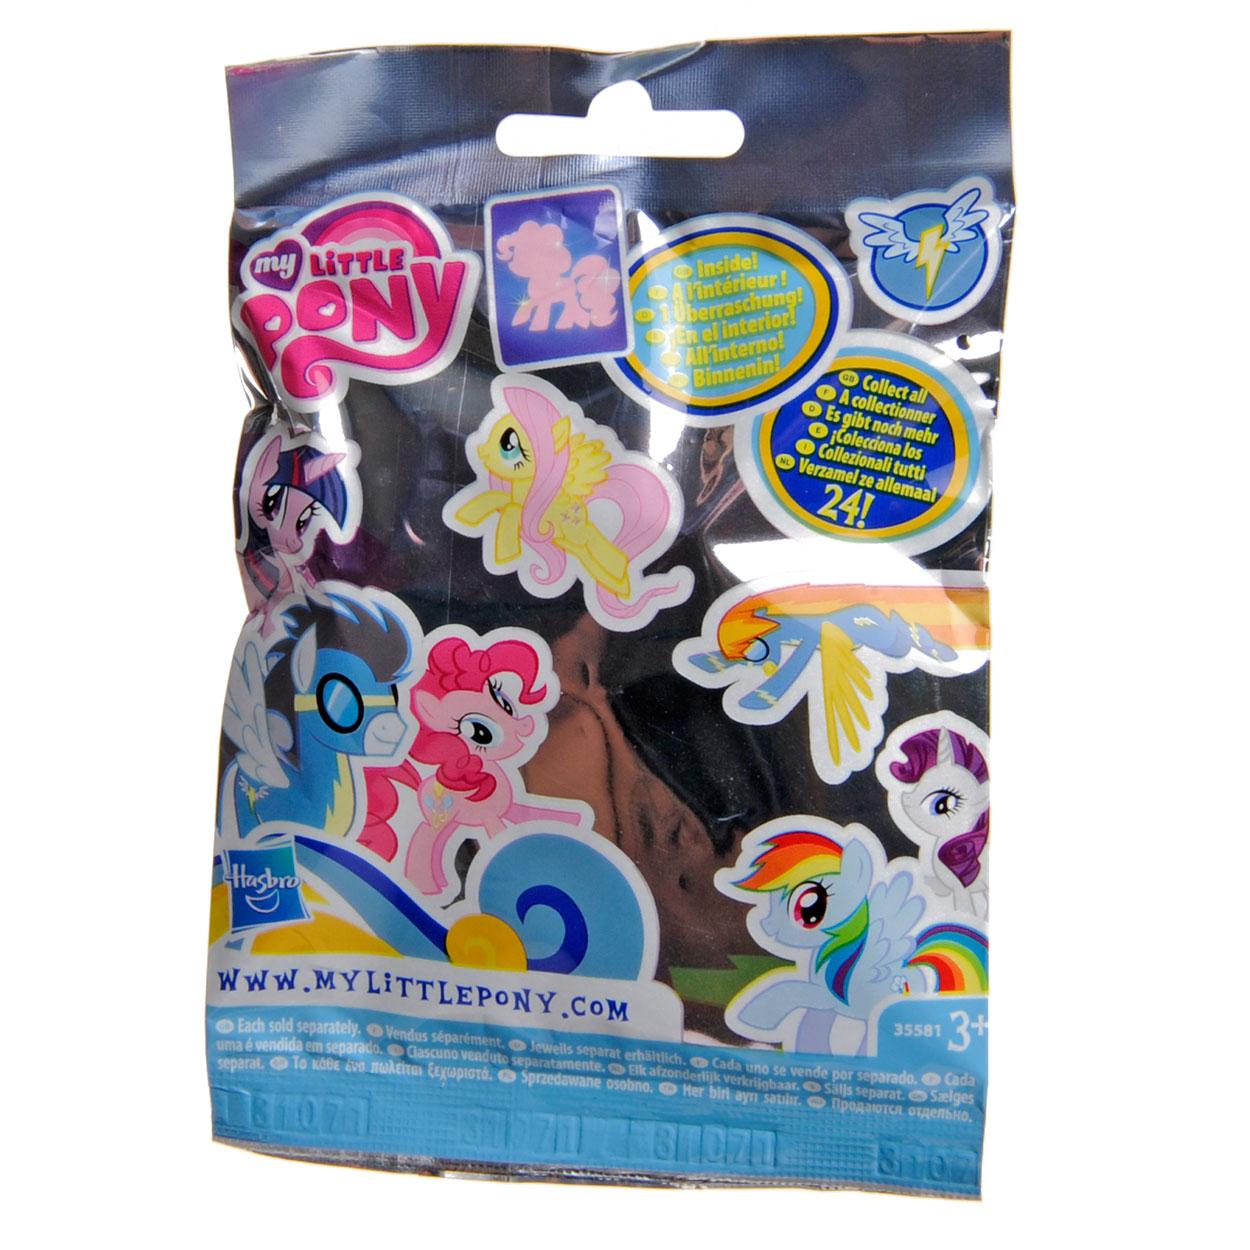 My Little Pony verrassingszakje